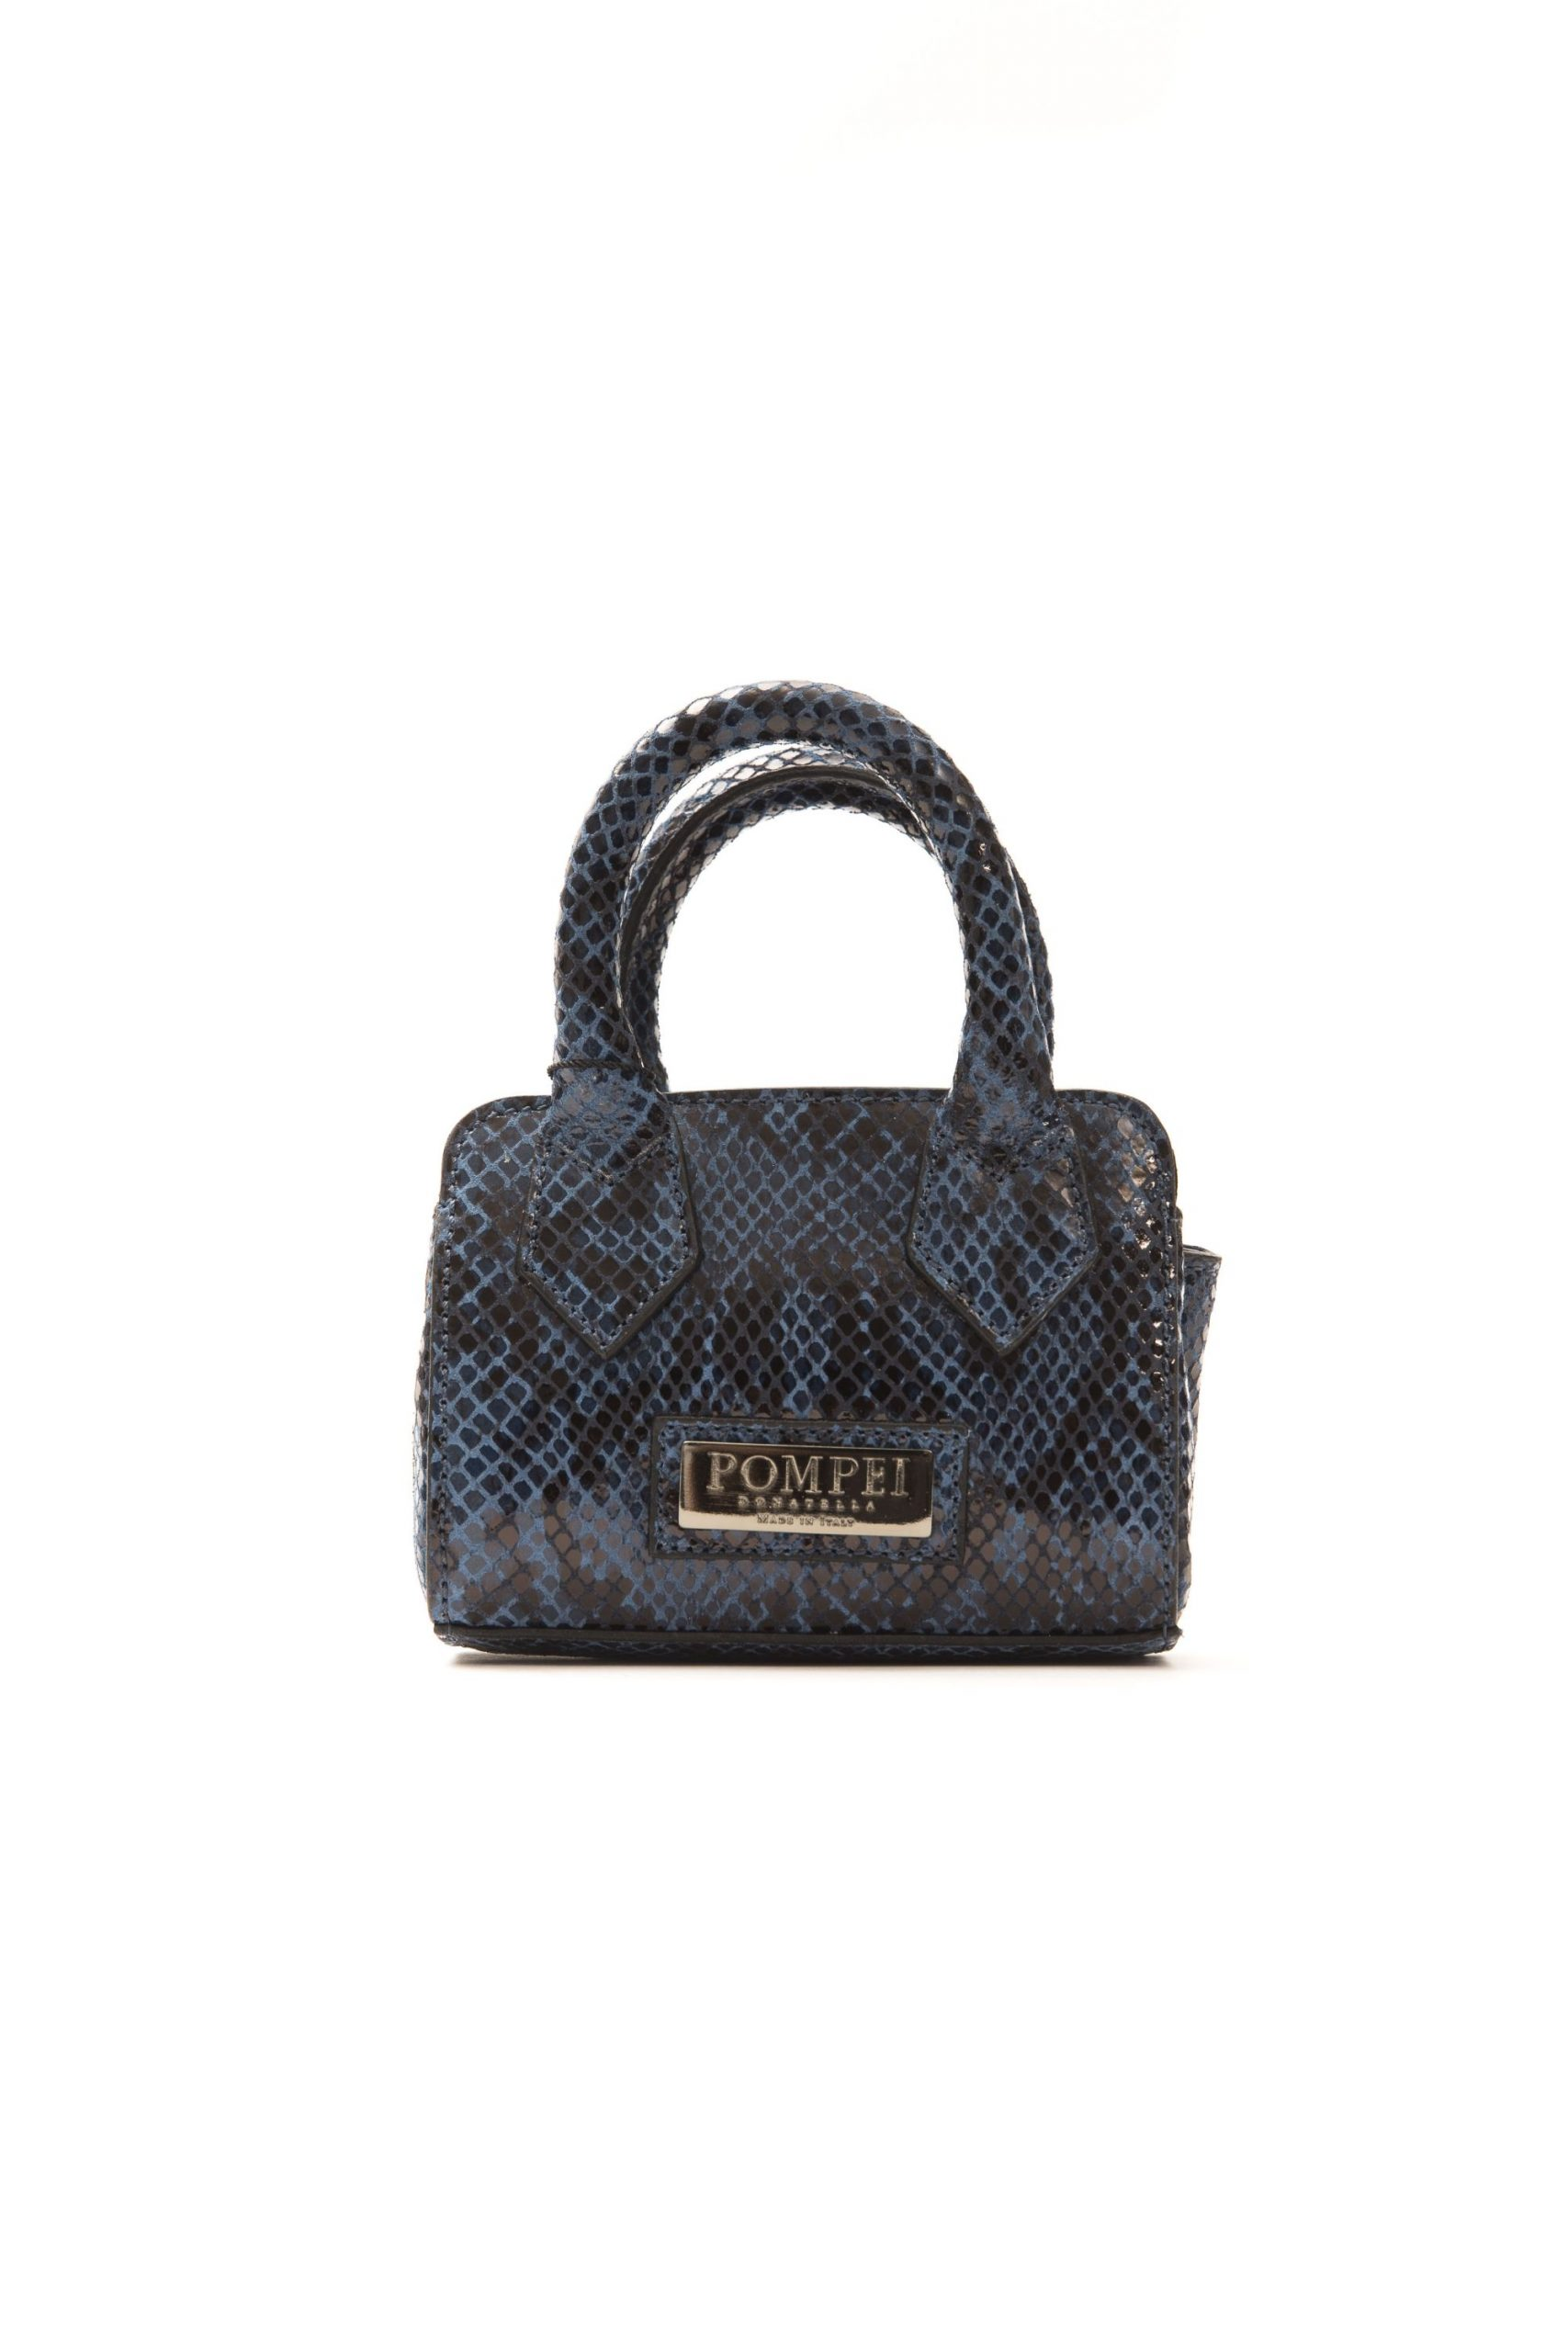 Pompei Donatella Women's Handbag Blue PO668382